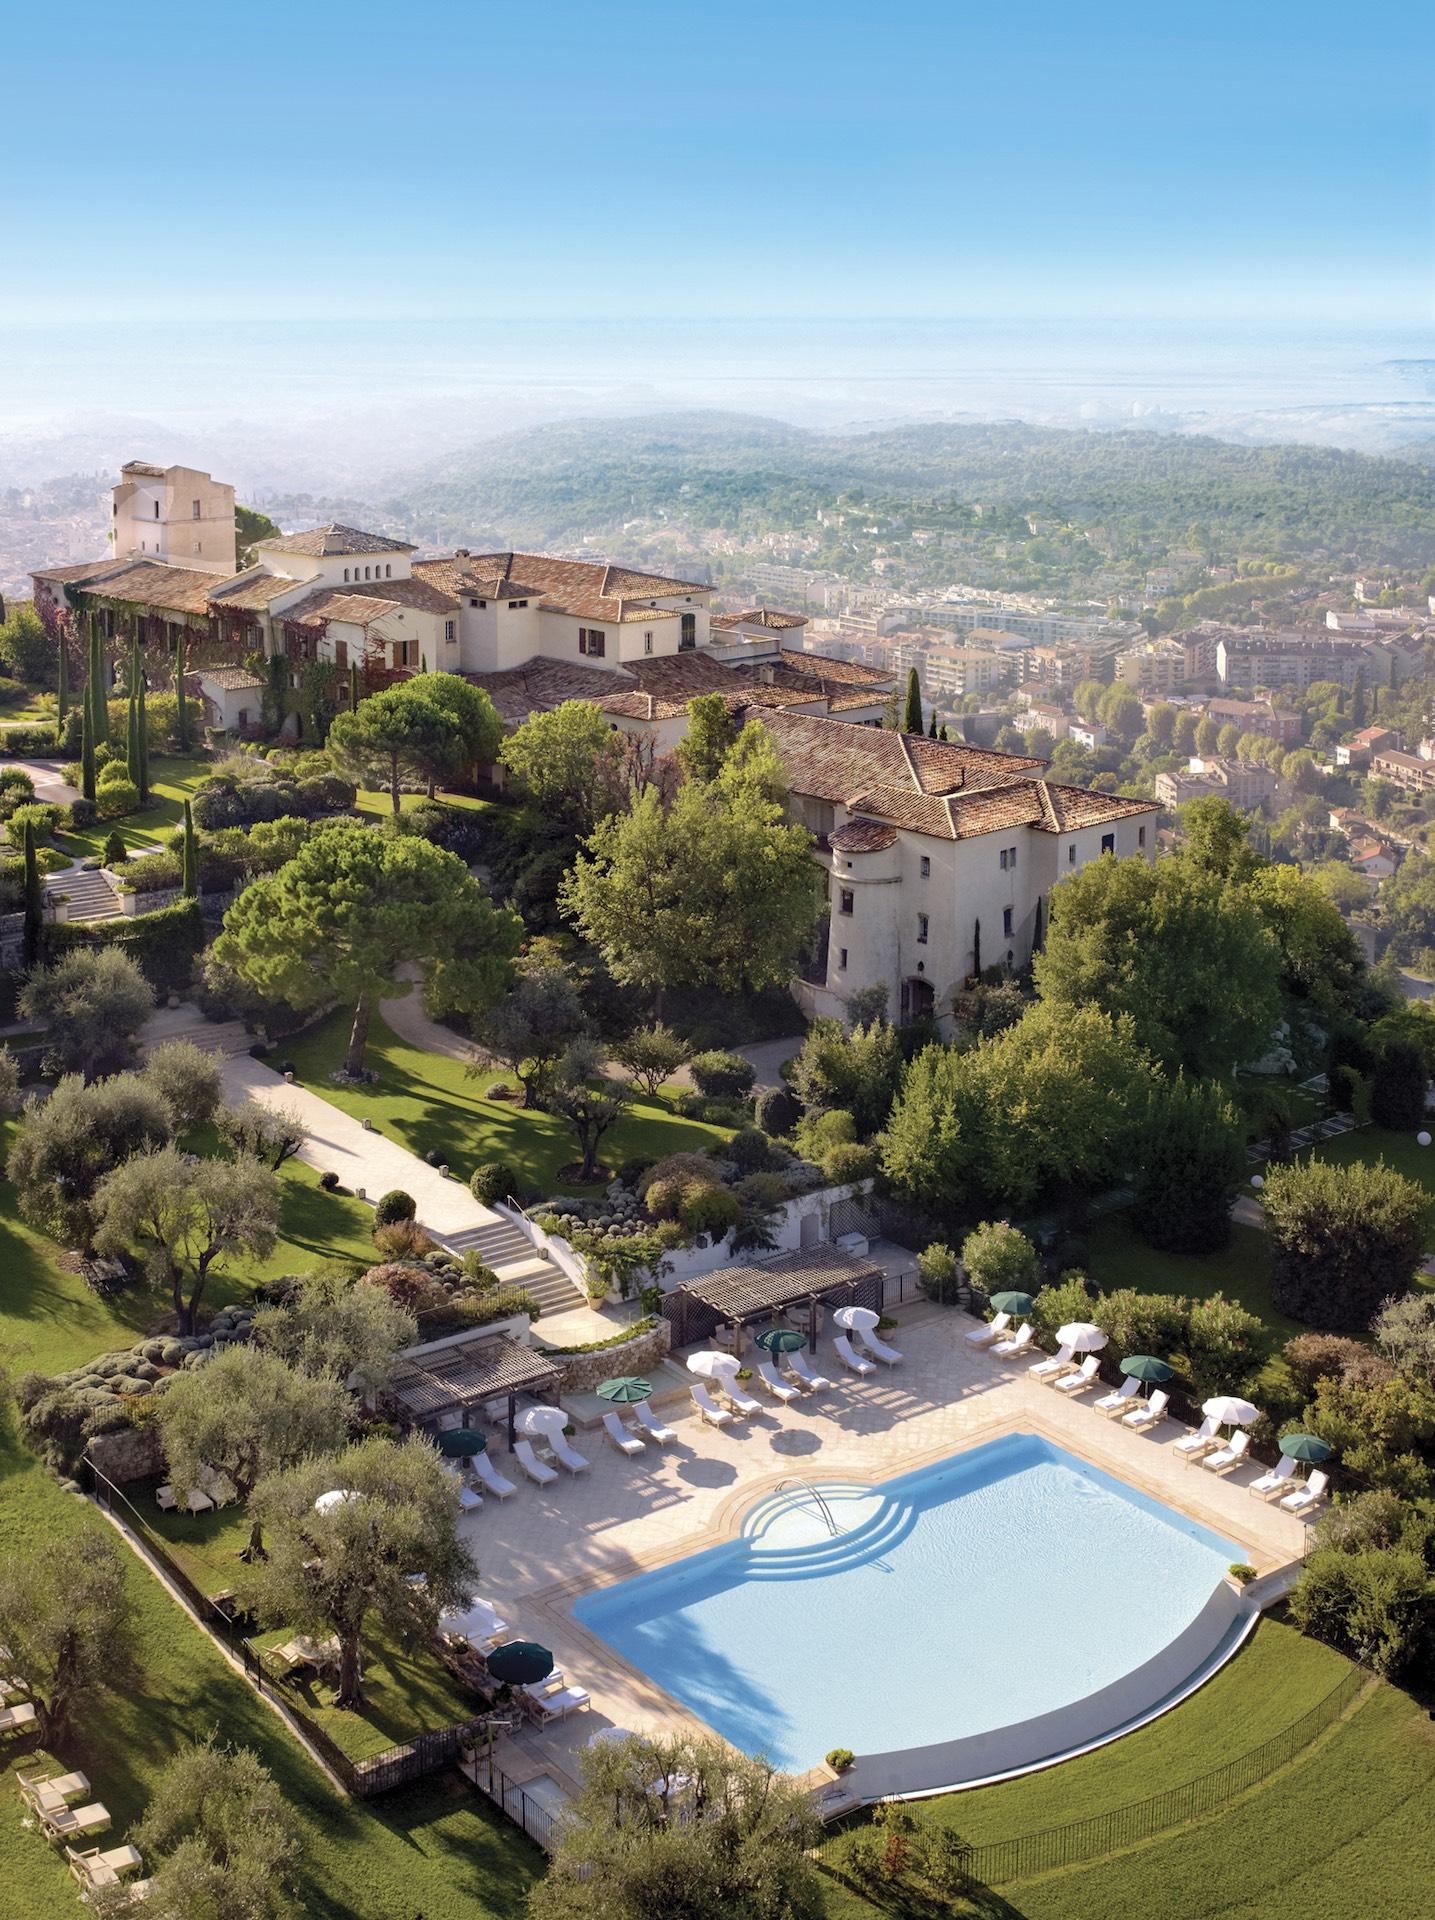 Château Saint-Martin & Spa, Vence French Riviera